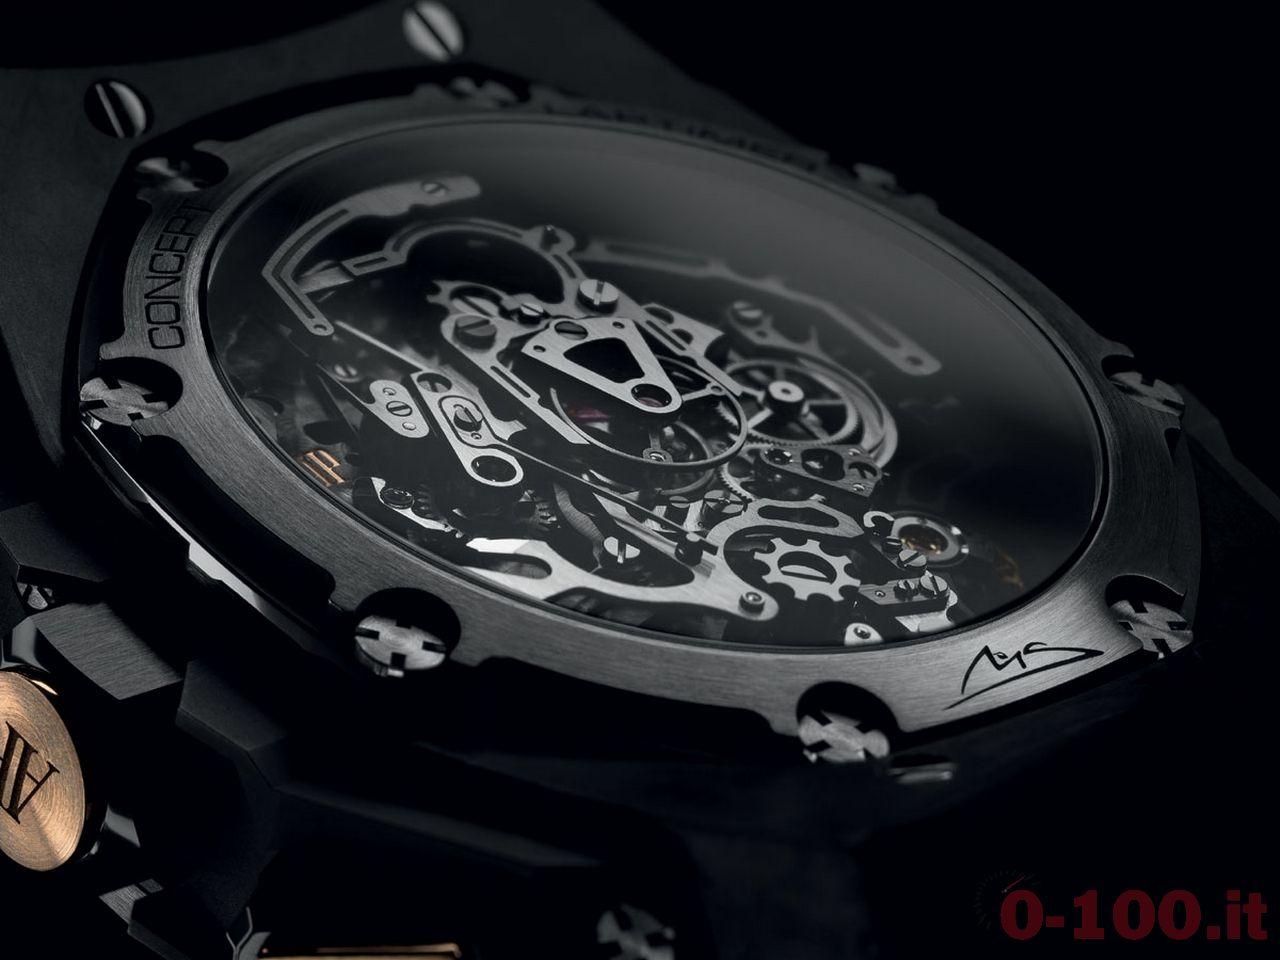 audemars-piguet-royal-oak-concept-laptimer-michael-schumacher-limited-edition-ref-26221ft-oo-d002ca-01_0-1004